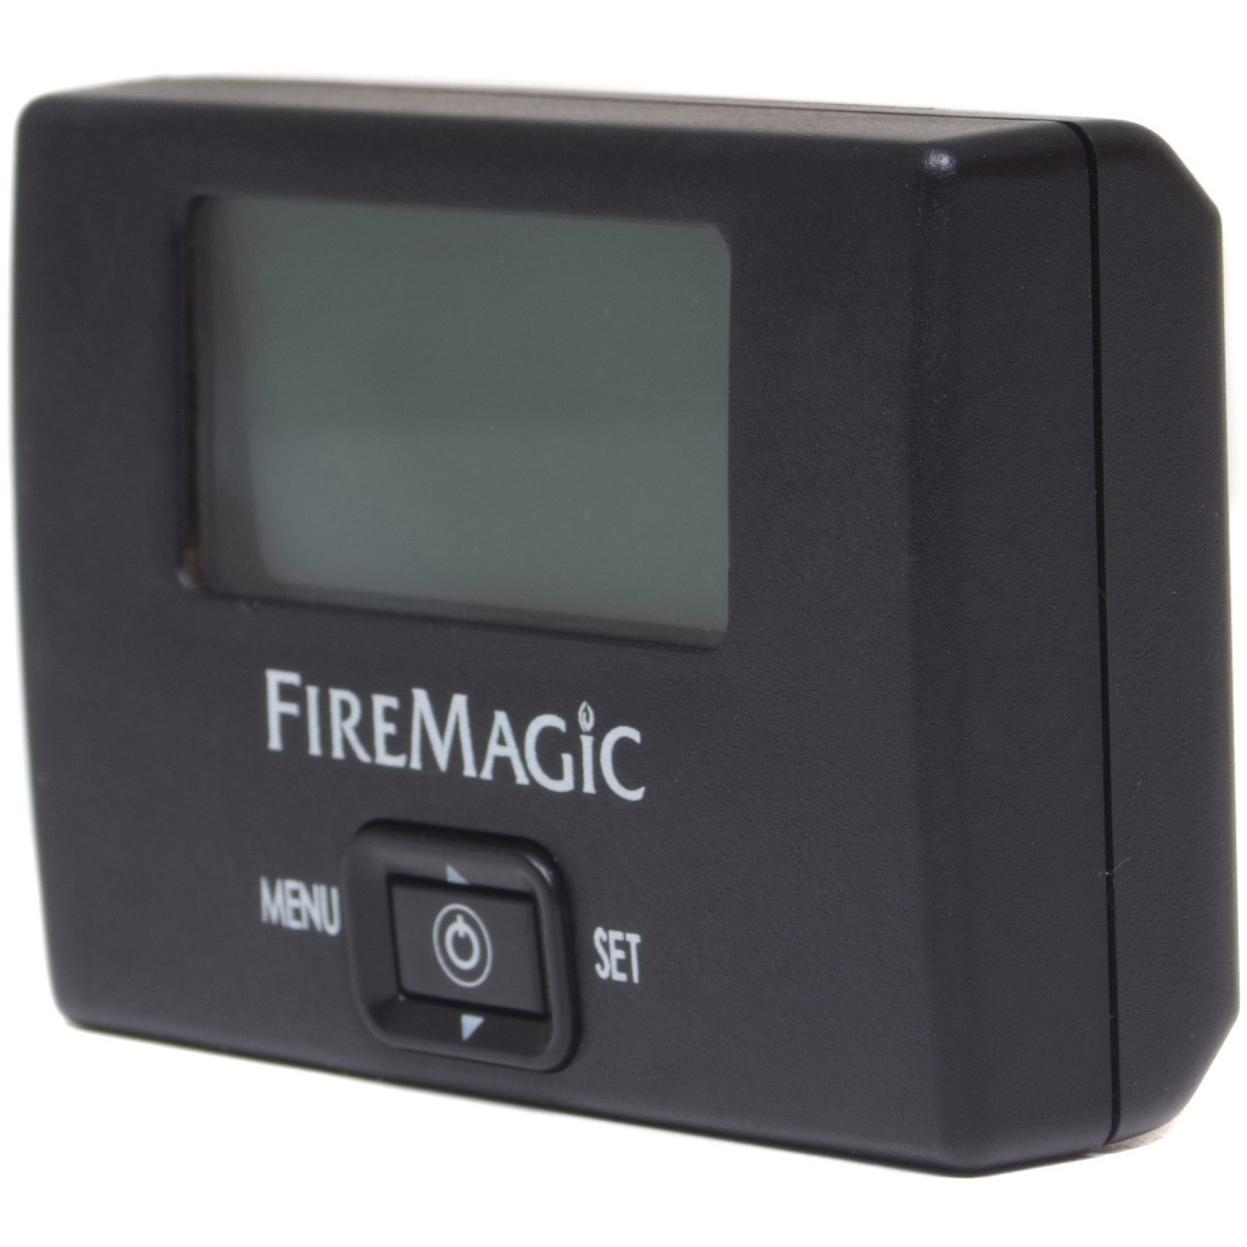 Fire Magic Thermometer Remote Receiver For Echelon Diamond Gas Grills